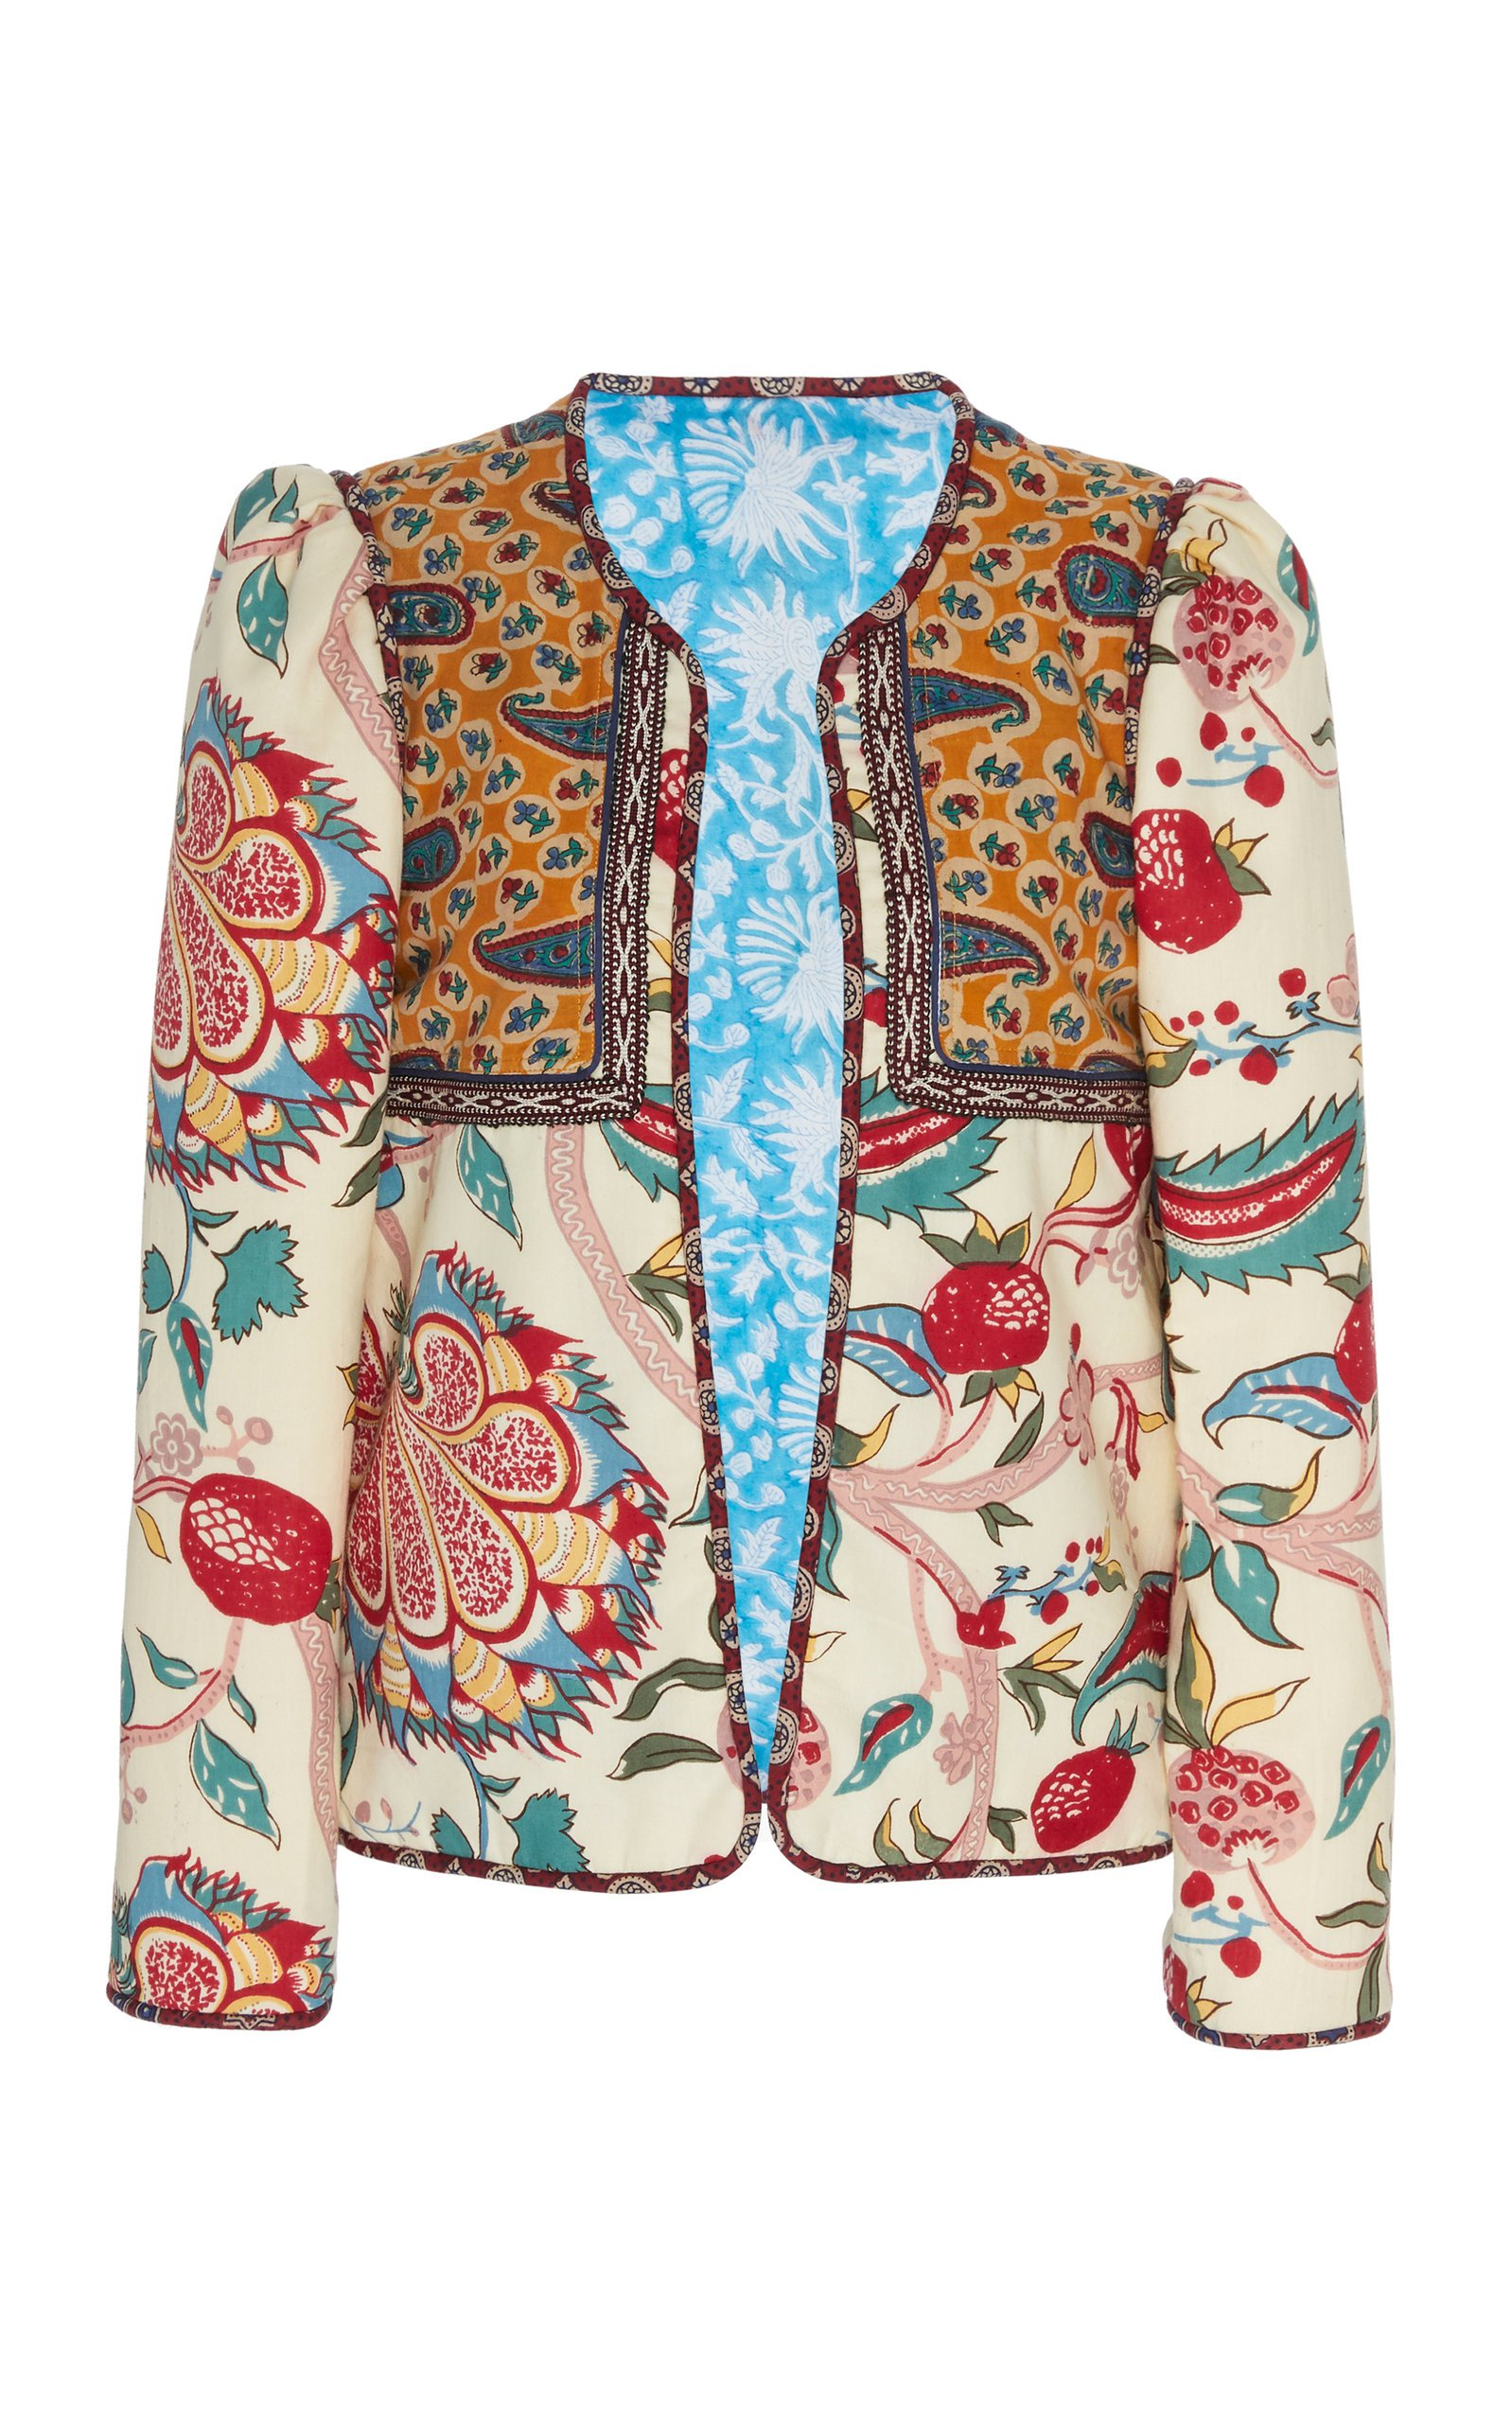 Alix of Bohemia Pomegranate Cotton Jacket Size: XS